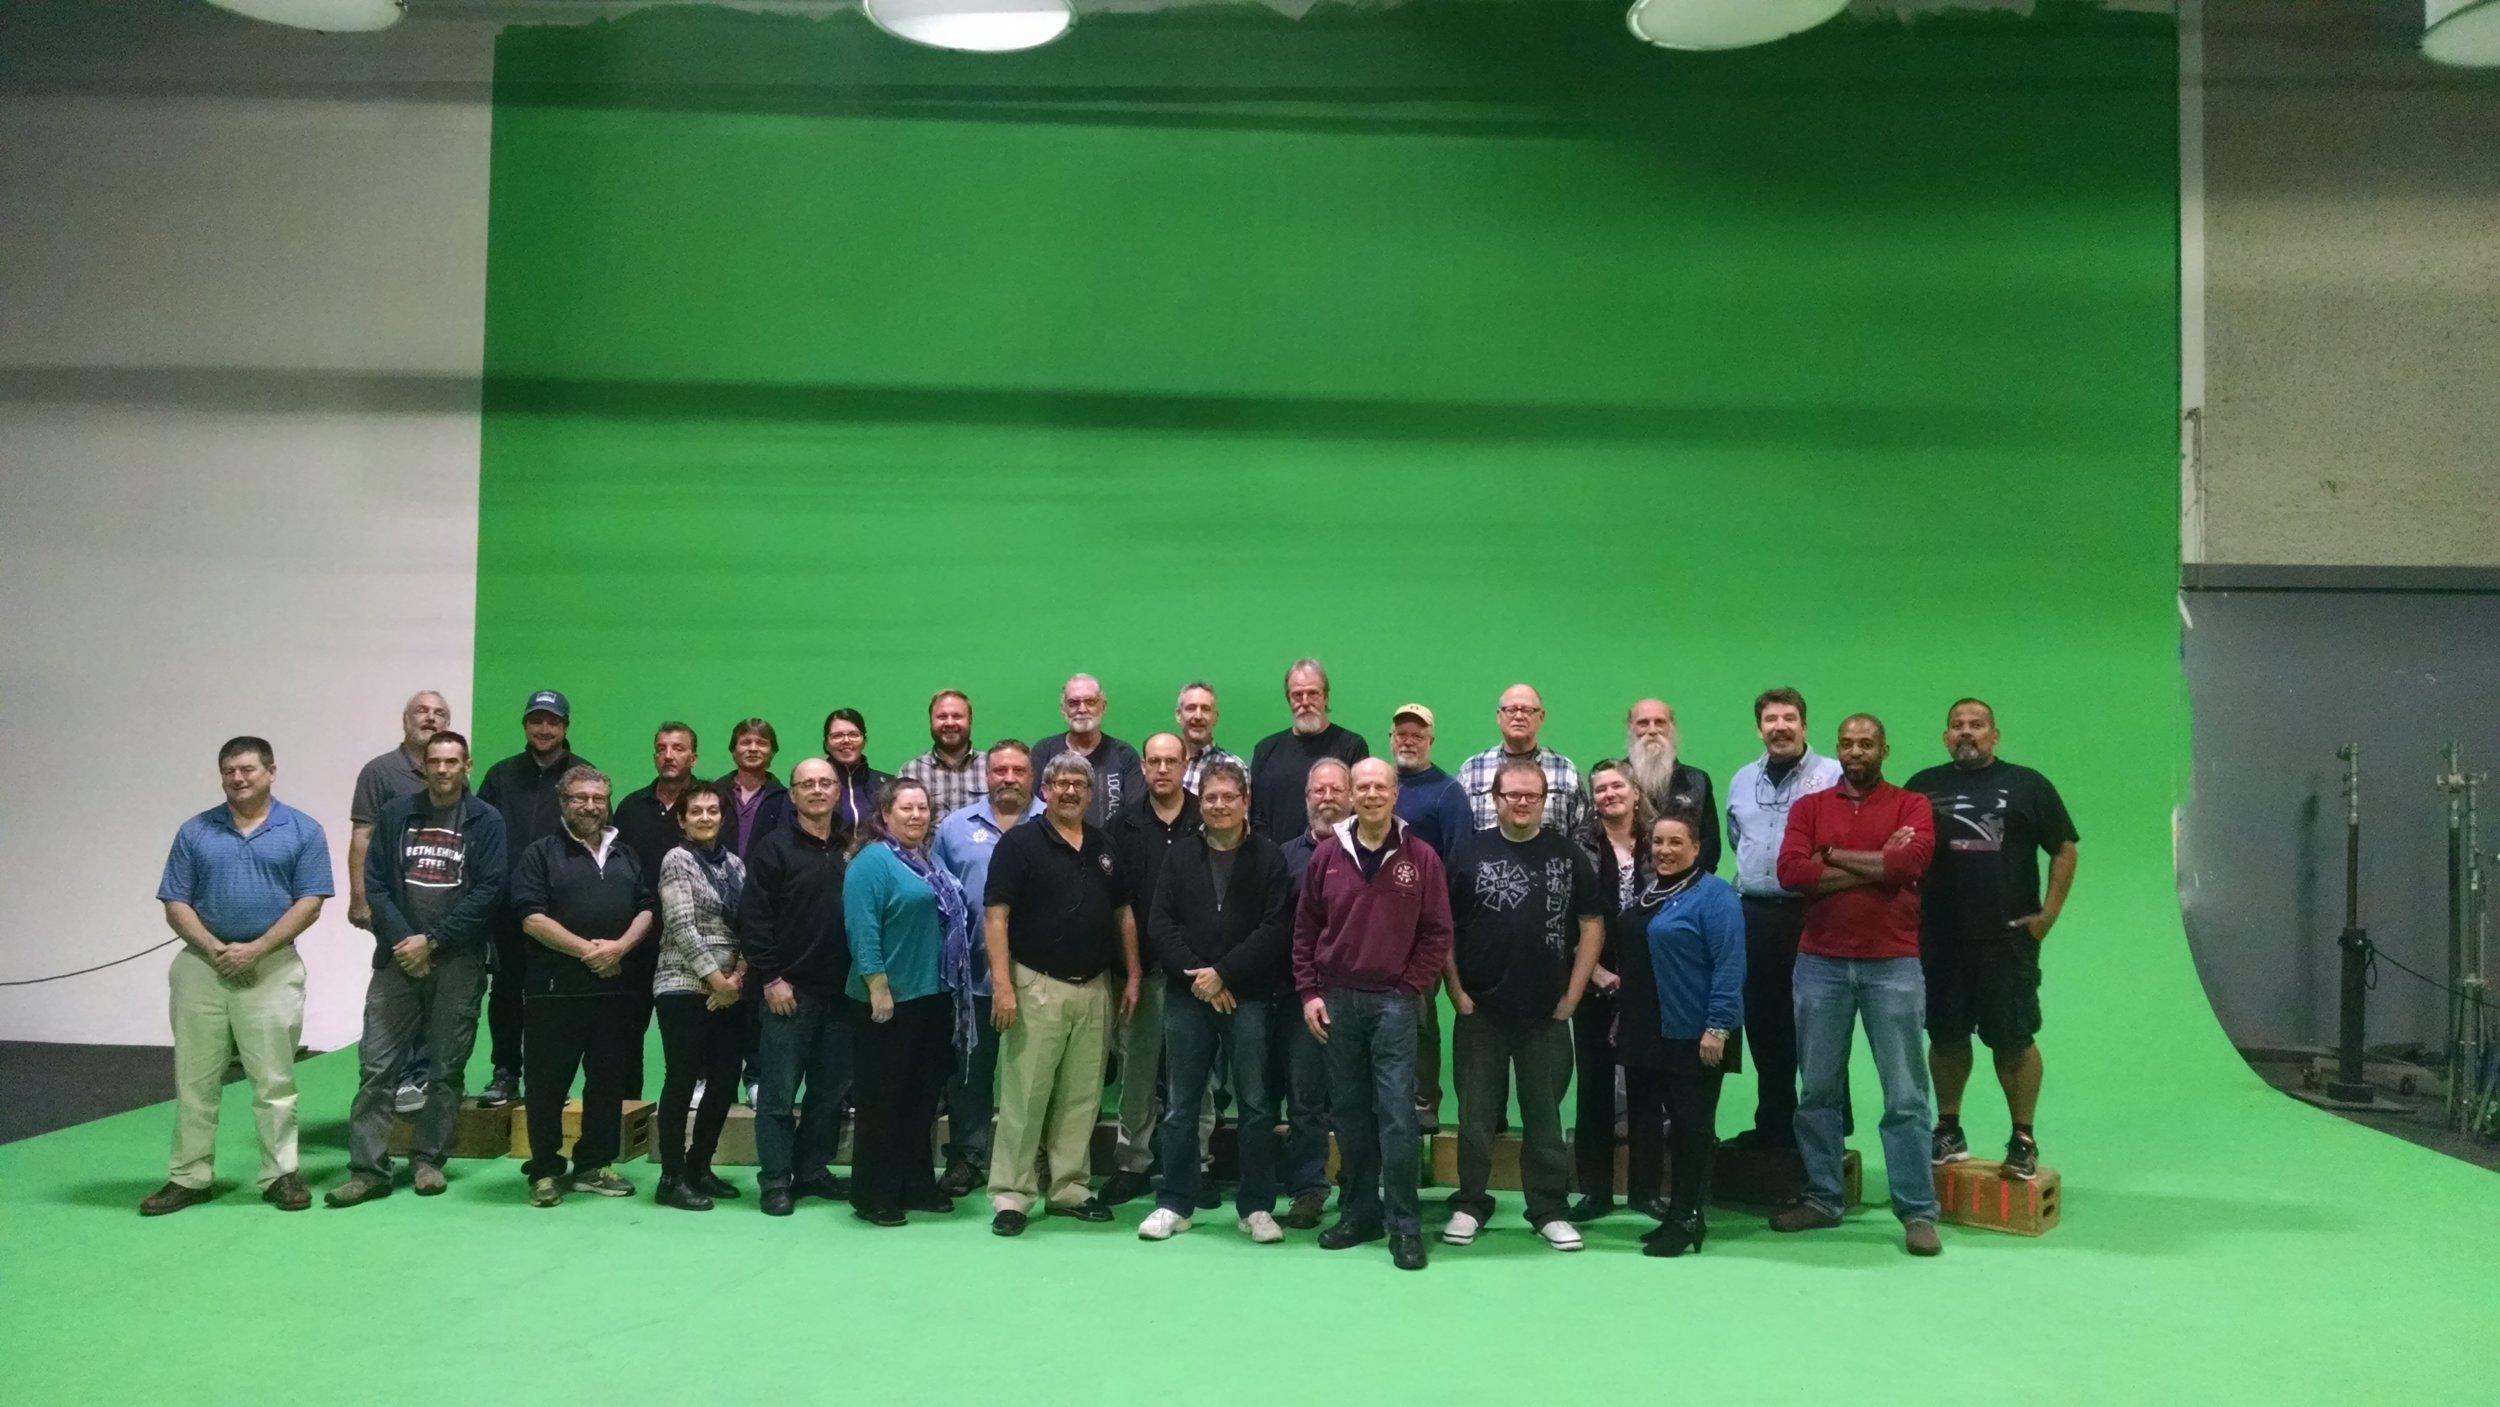 IATSE TTF Train the Trainer in Boston, MA | November 7 & 8, 2015